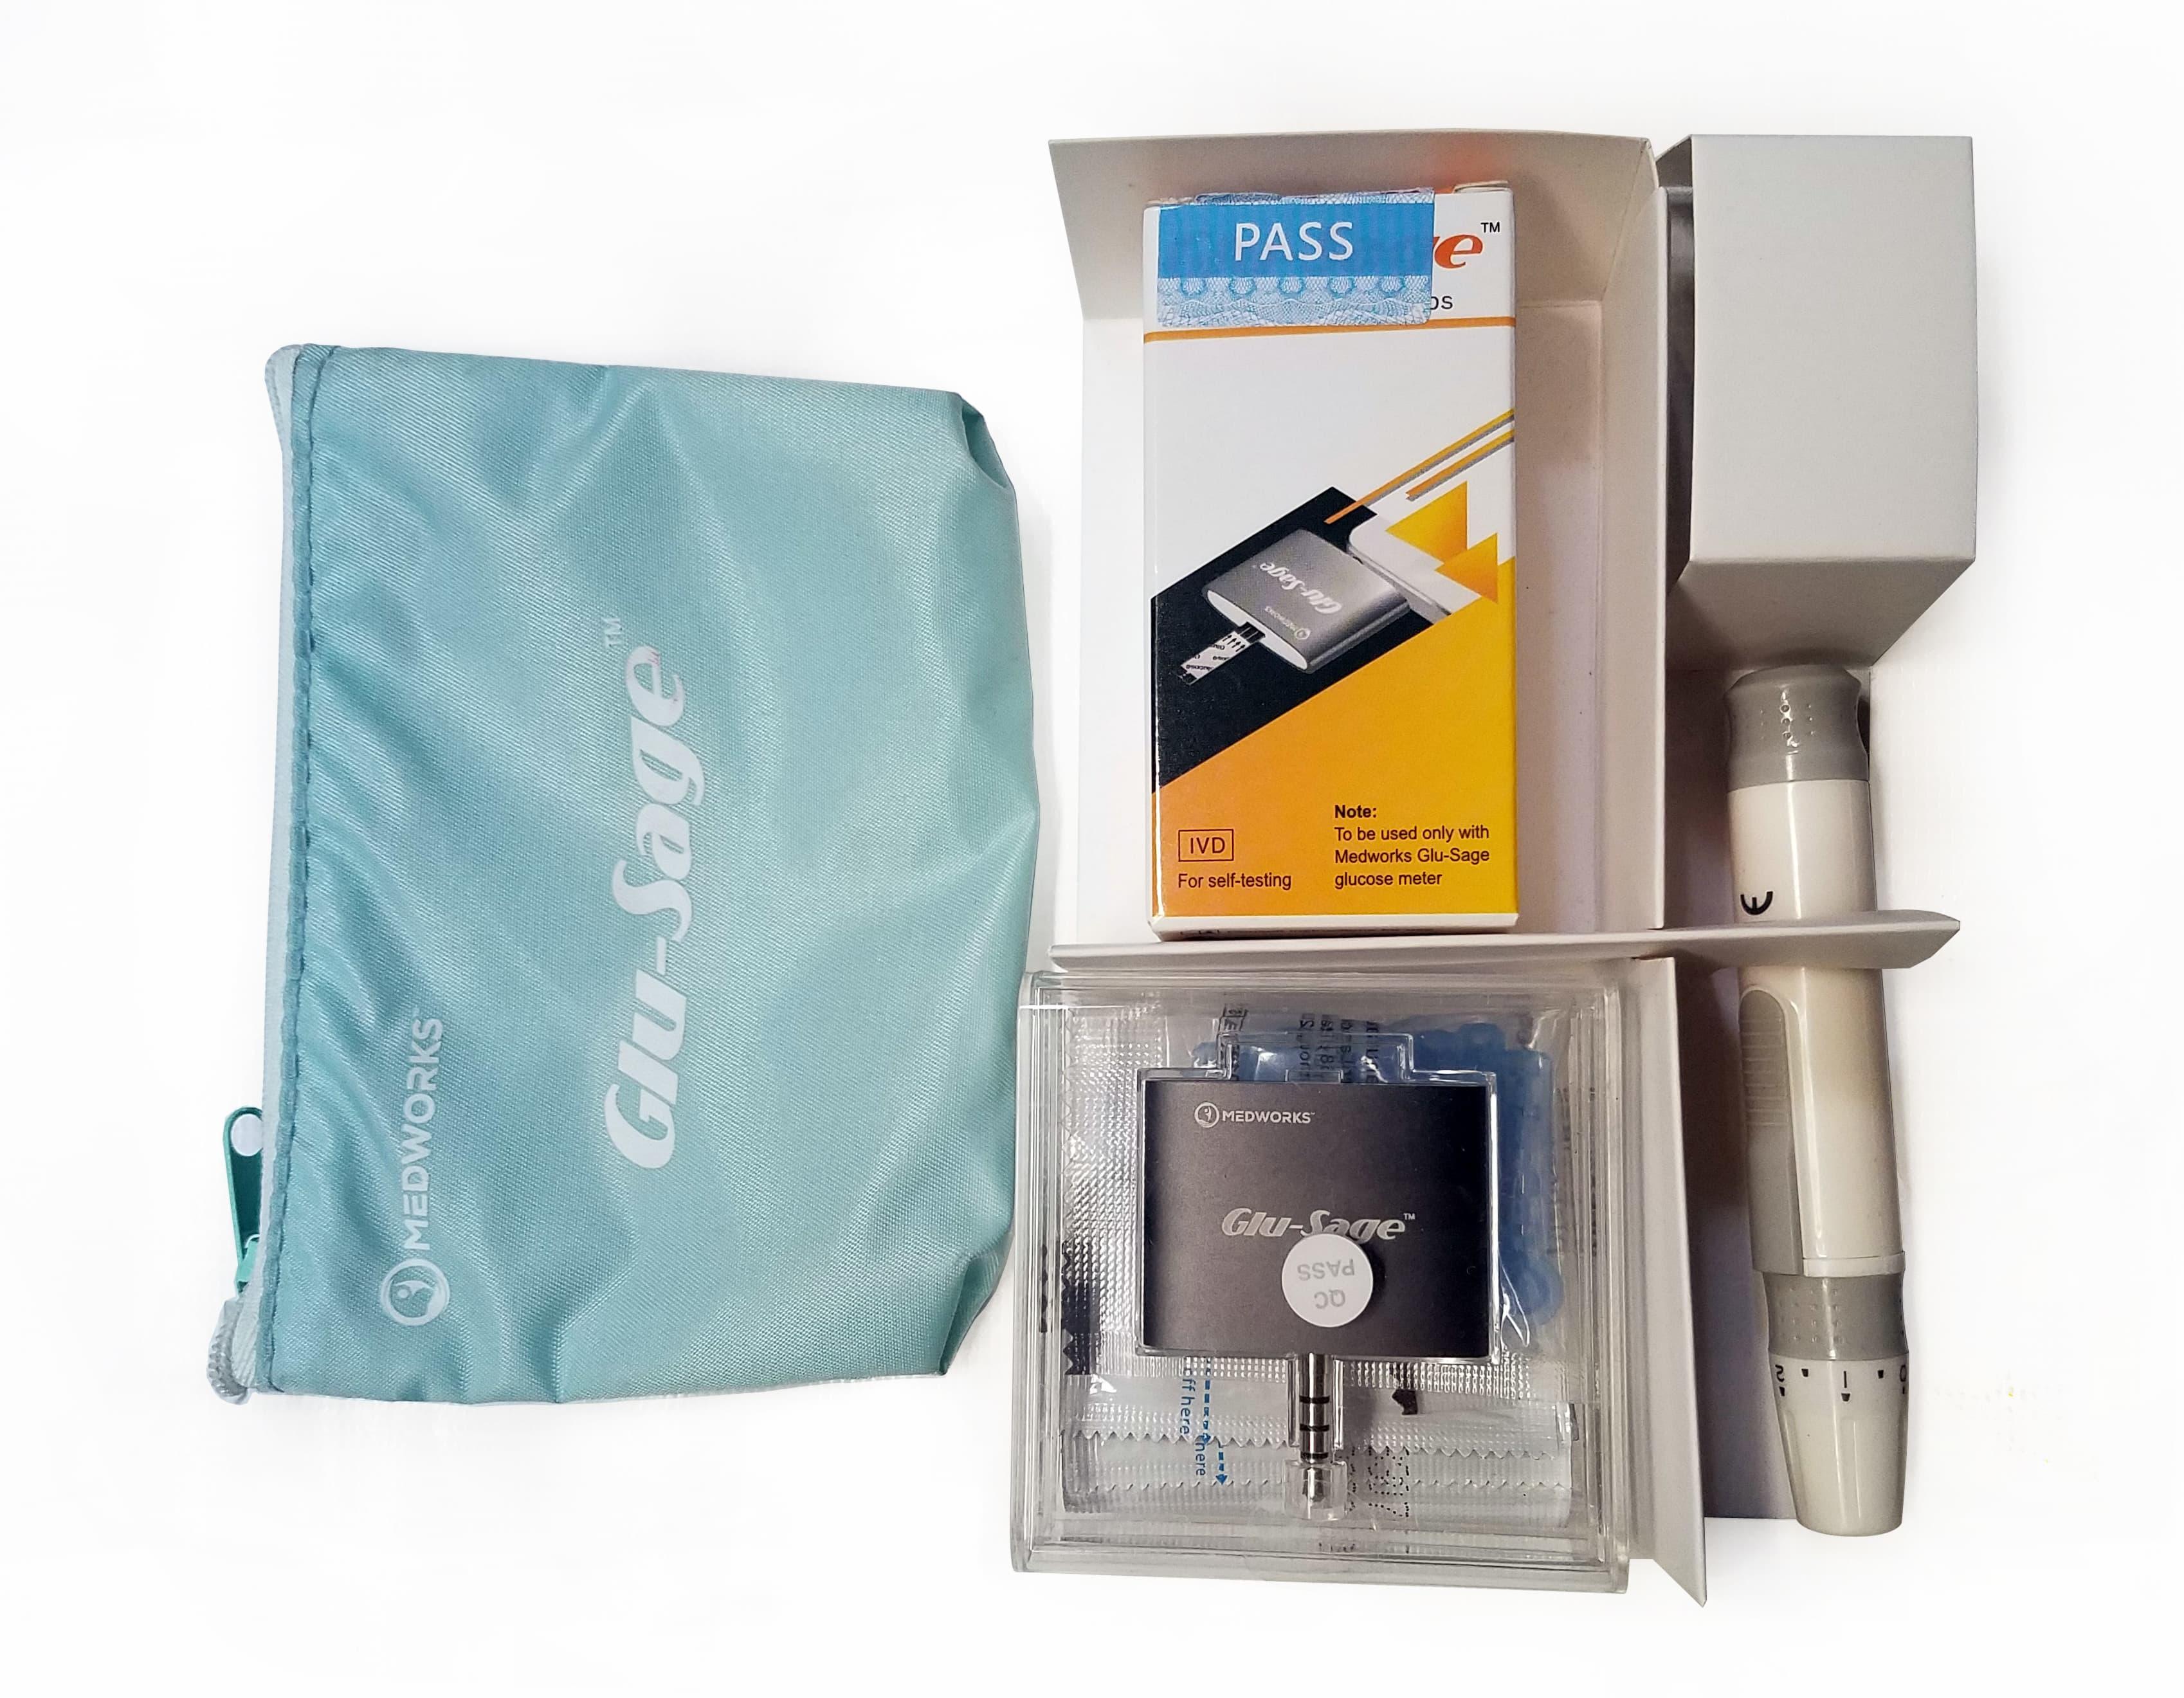 Glu-Sage kit contents.